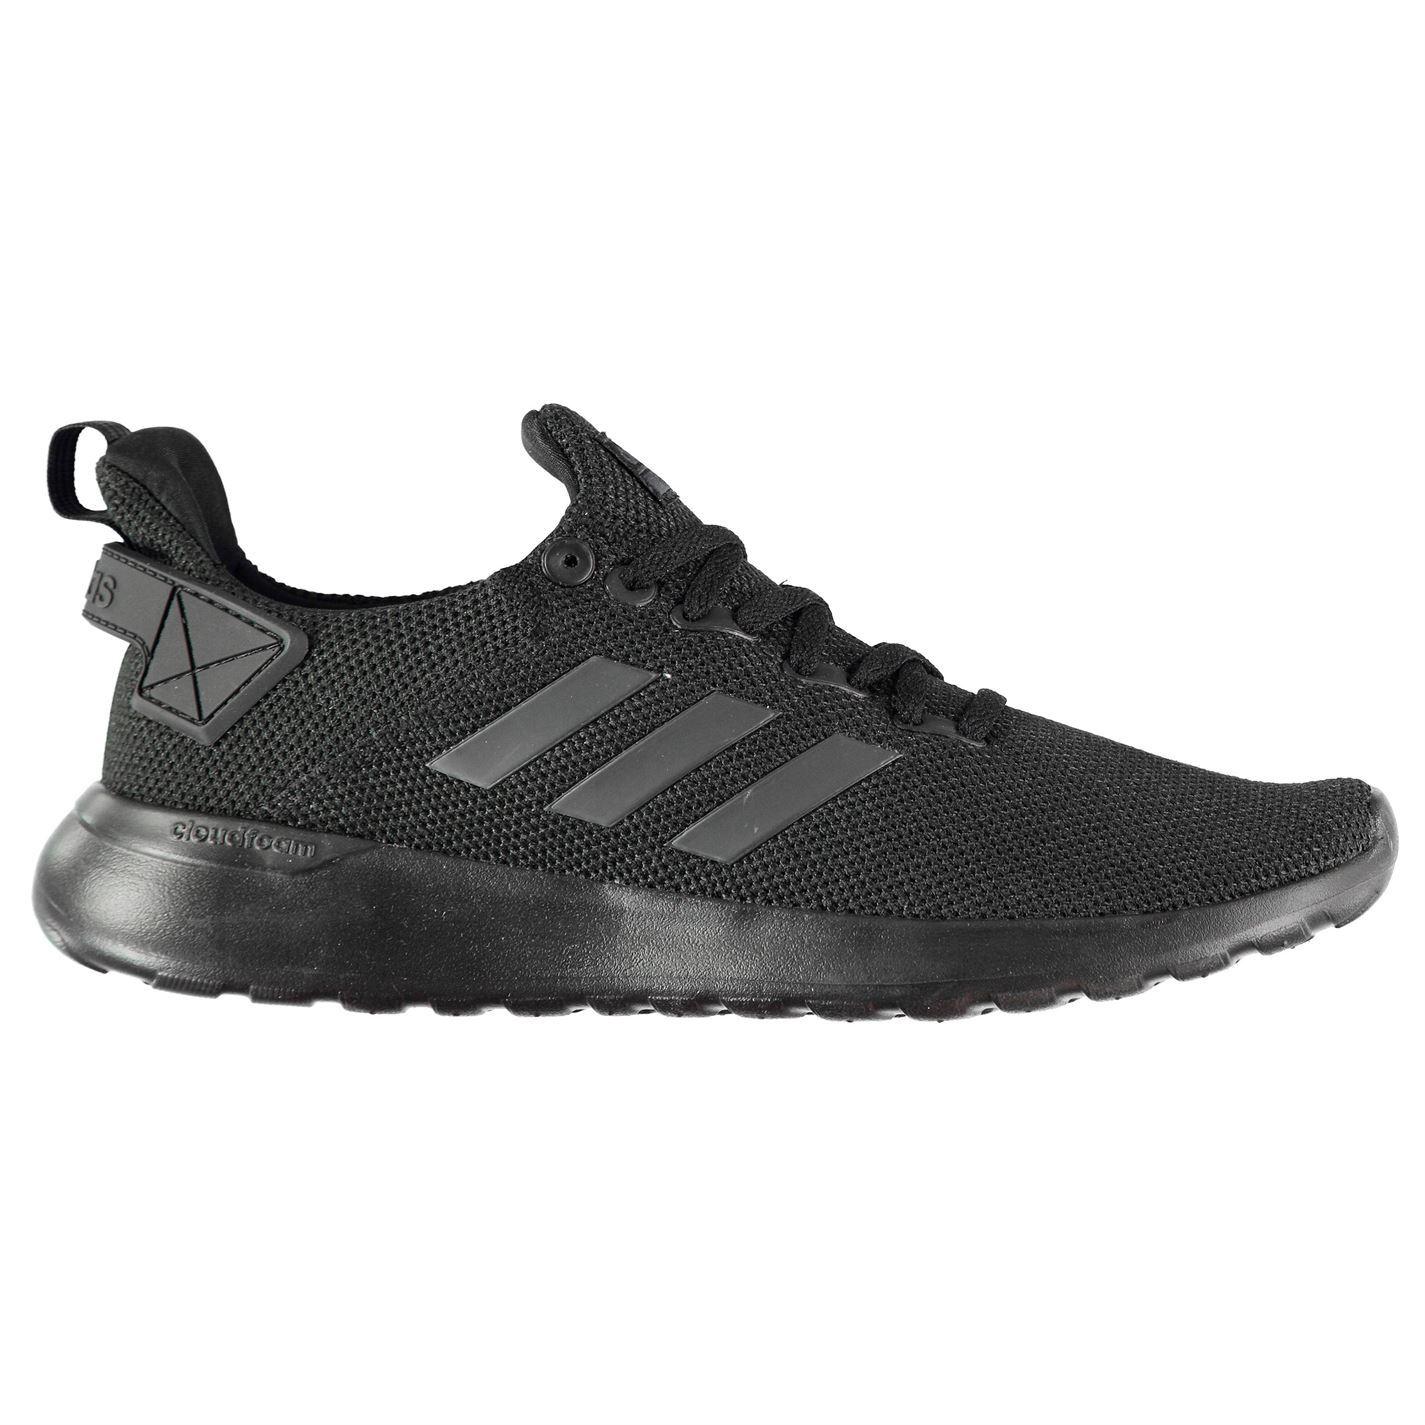 707a67552f ... Adidas Cloudfoam Lite Racer BYD instructores hombres negro deporte zapatos  zapatillas ...